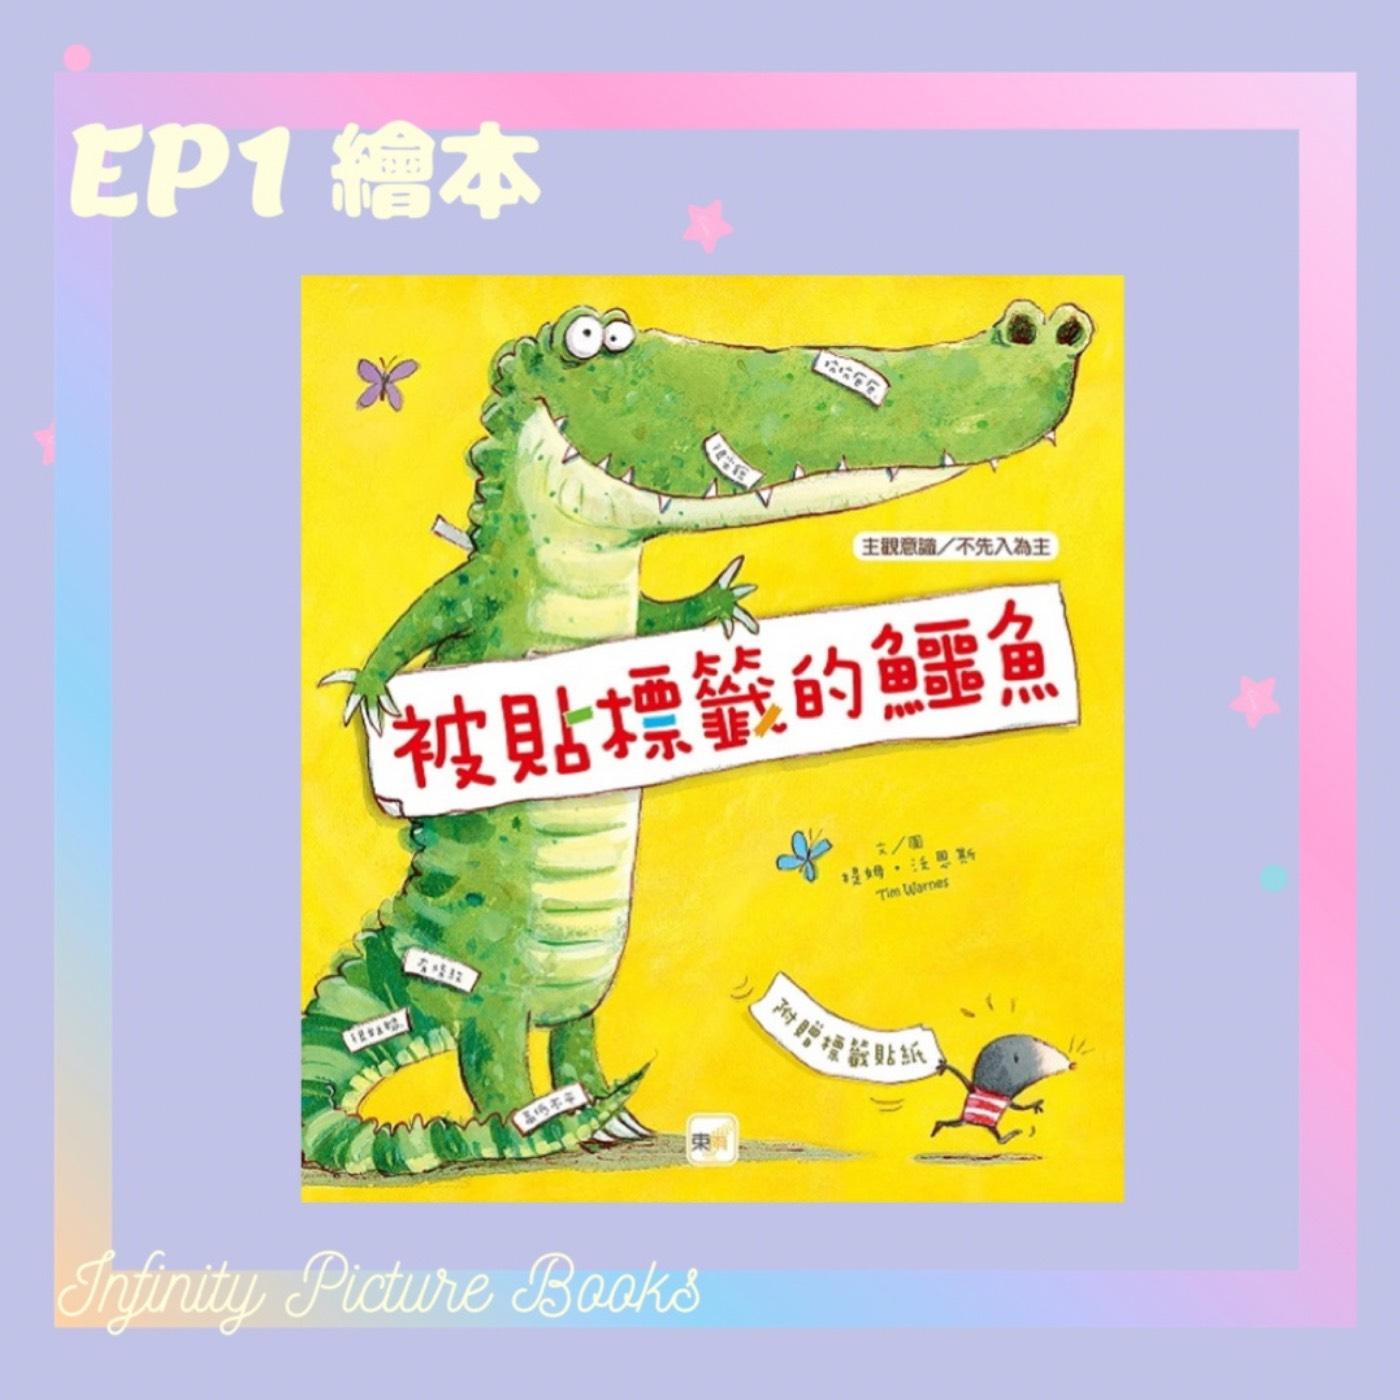 EP1 有一種力叫摩擦力 被貼標籤的鱷魚